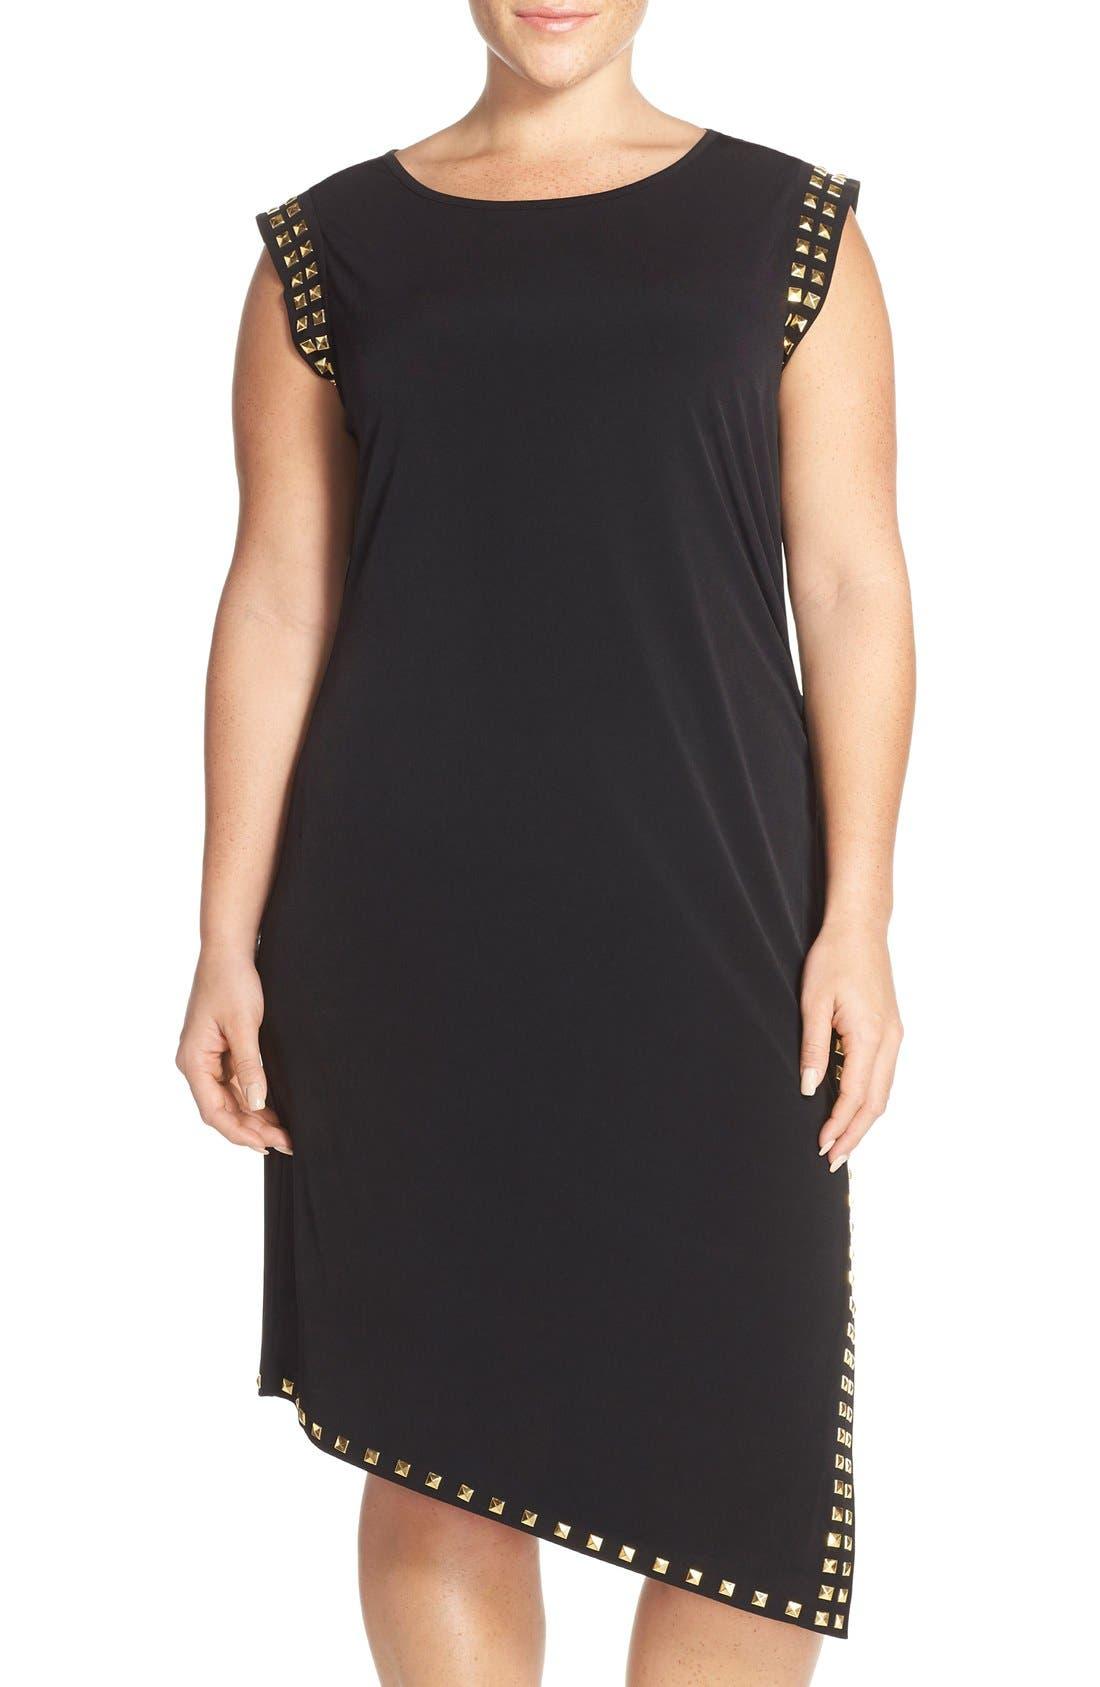 Studded Asymmetrical Shift Dress,                         Main,                         color, Black/ Gold